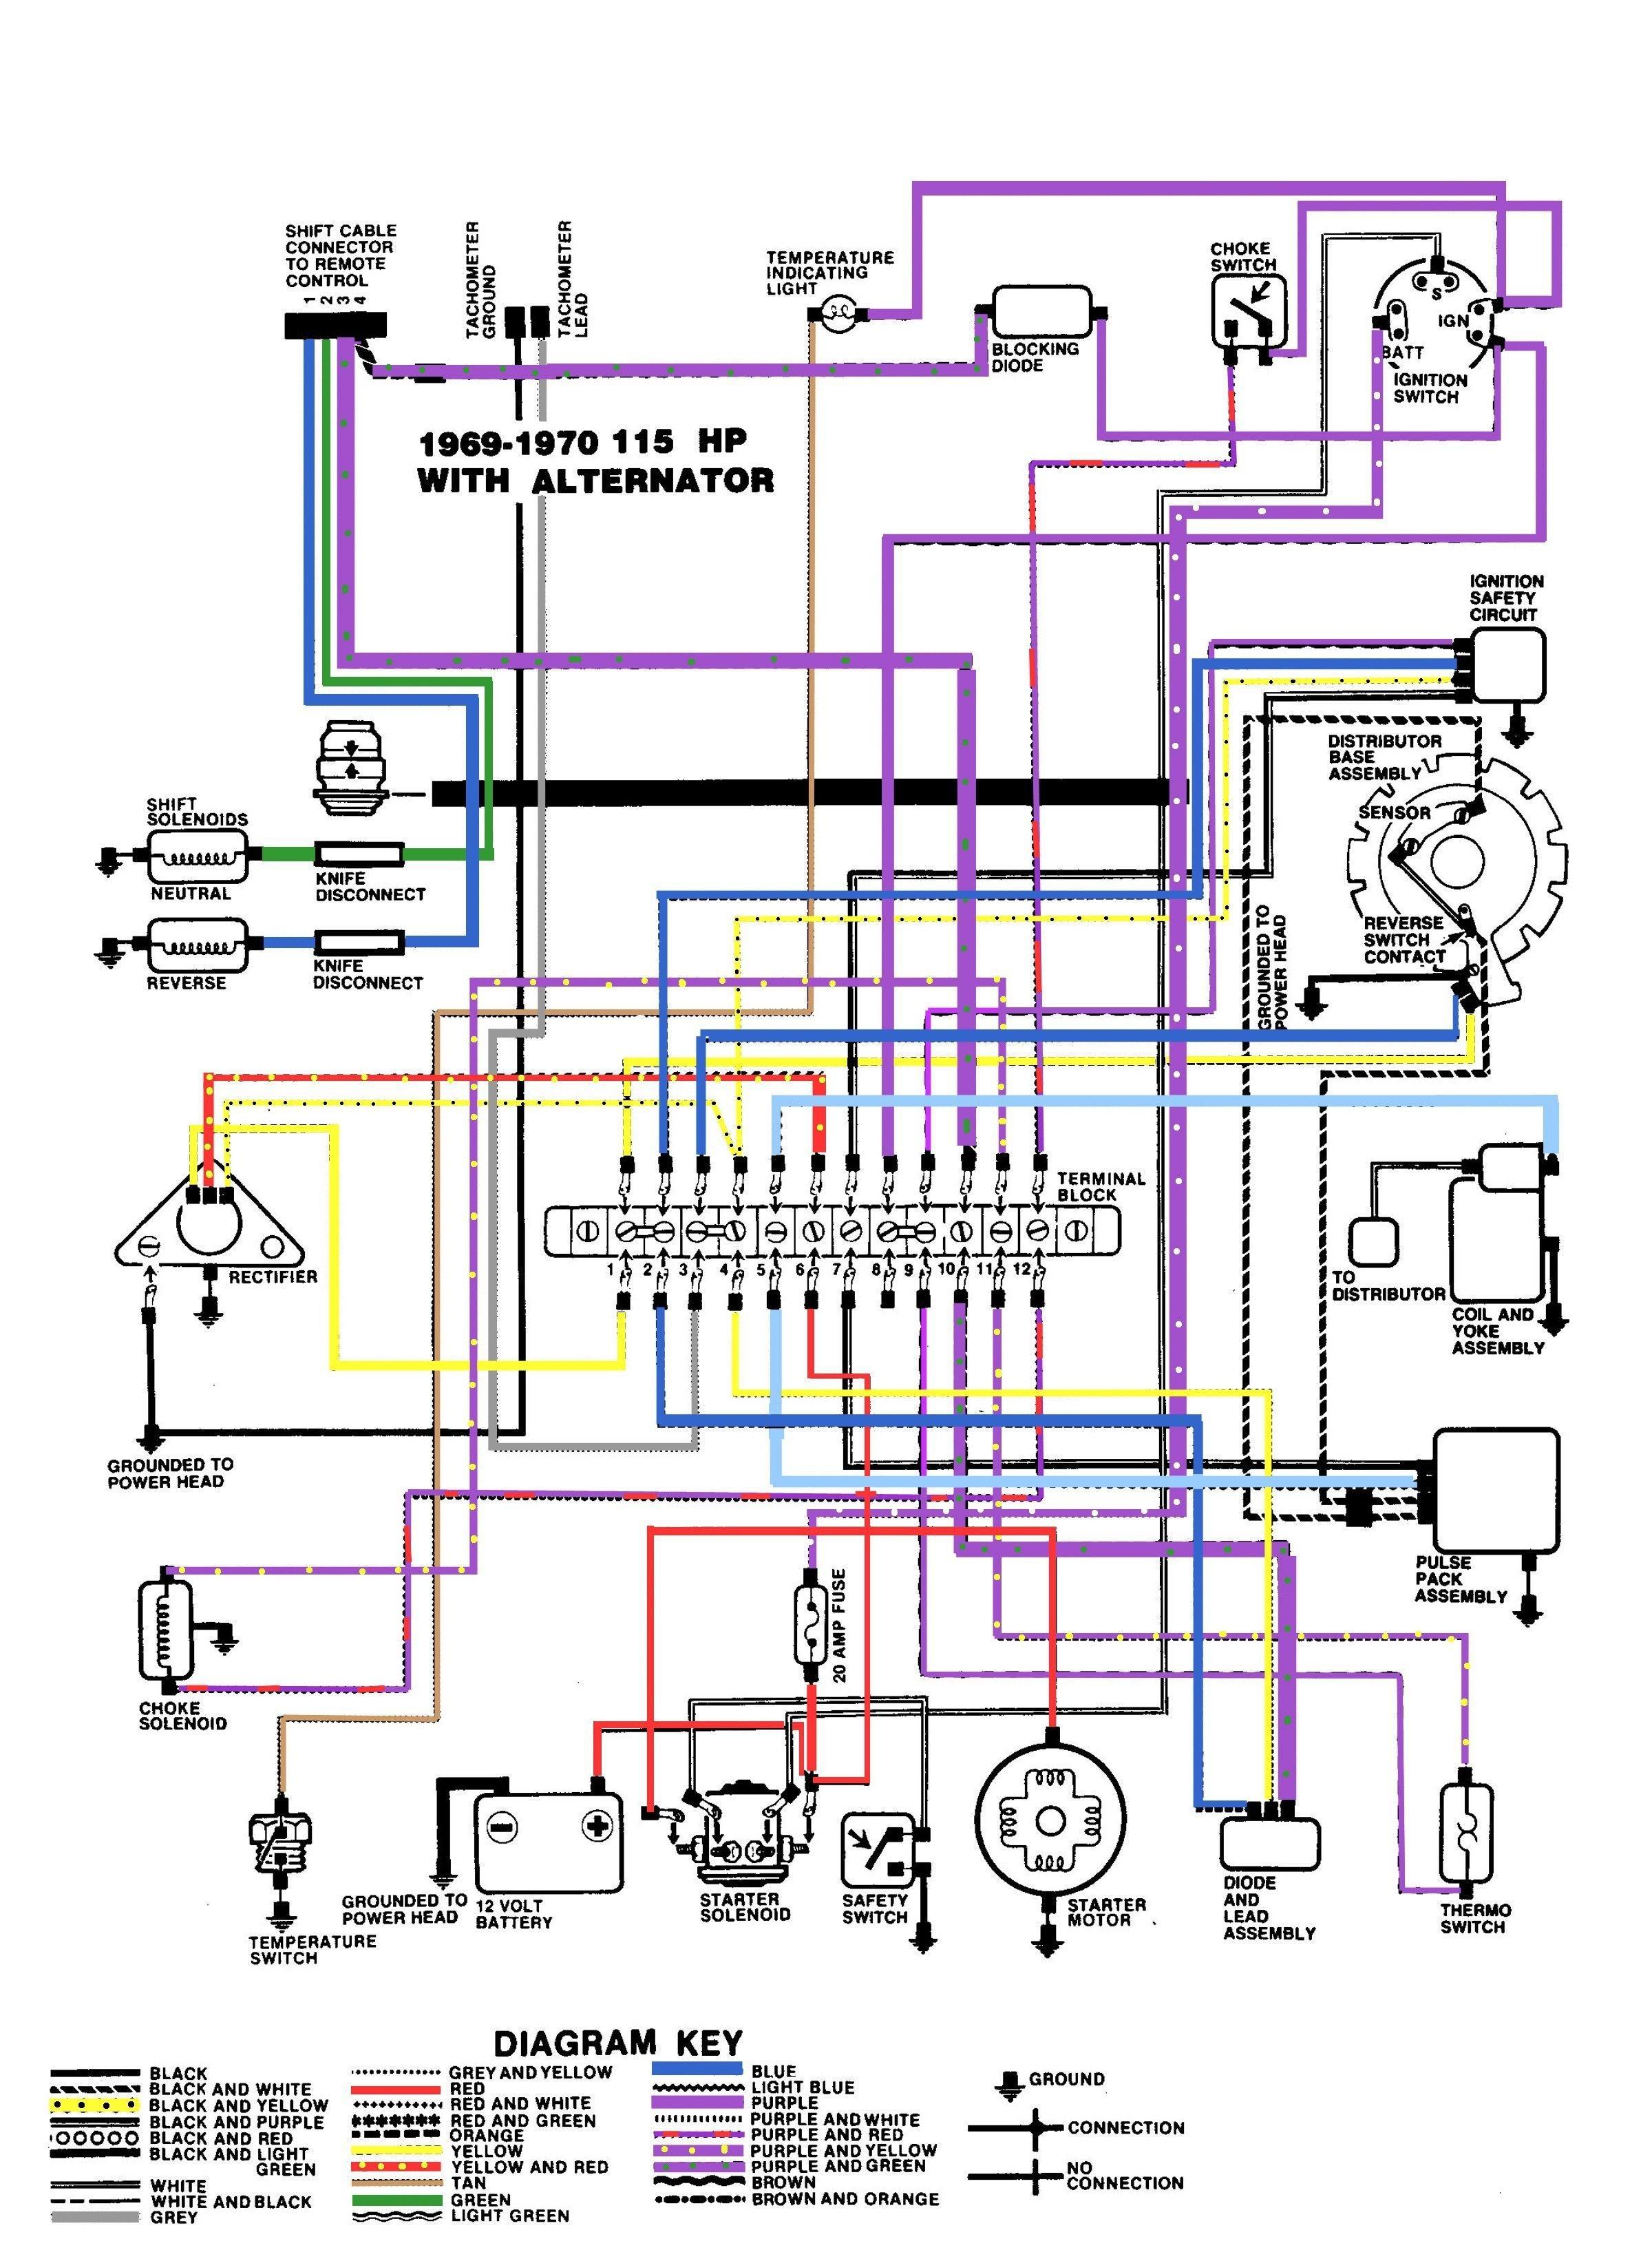 Berkel Wiring Diagram Evinrude Power Pack Wiring Diagram Inspirational 70 Of Berkel Wiring Diagram